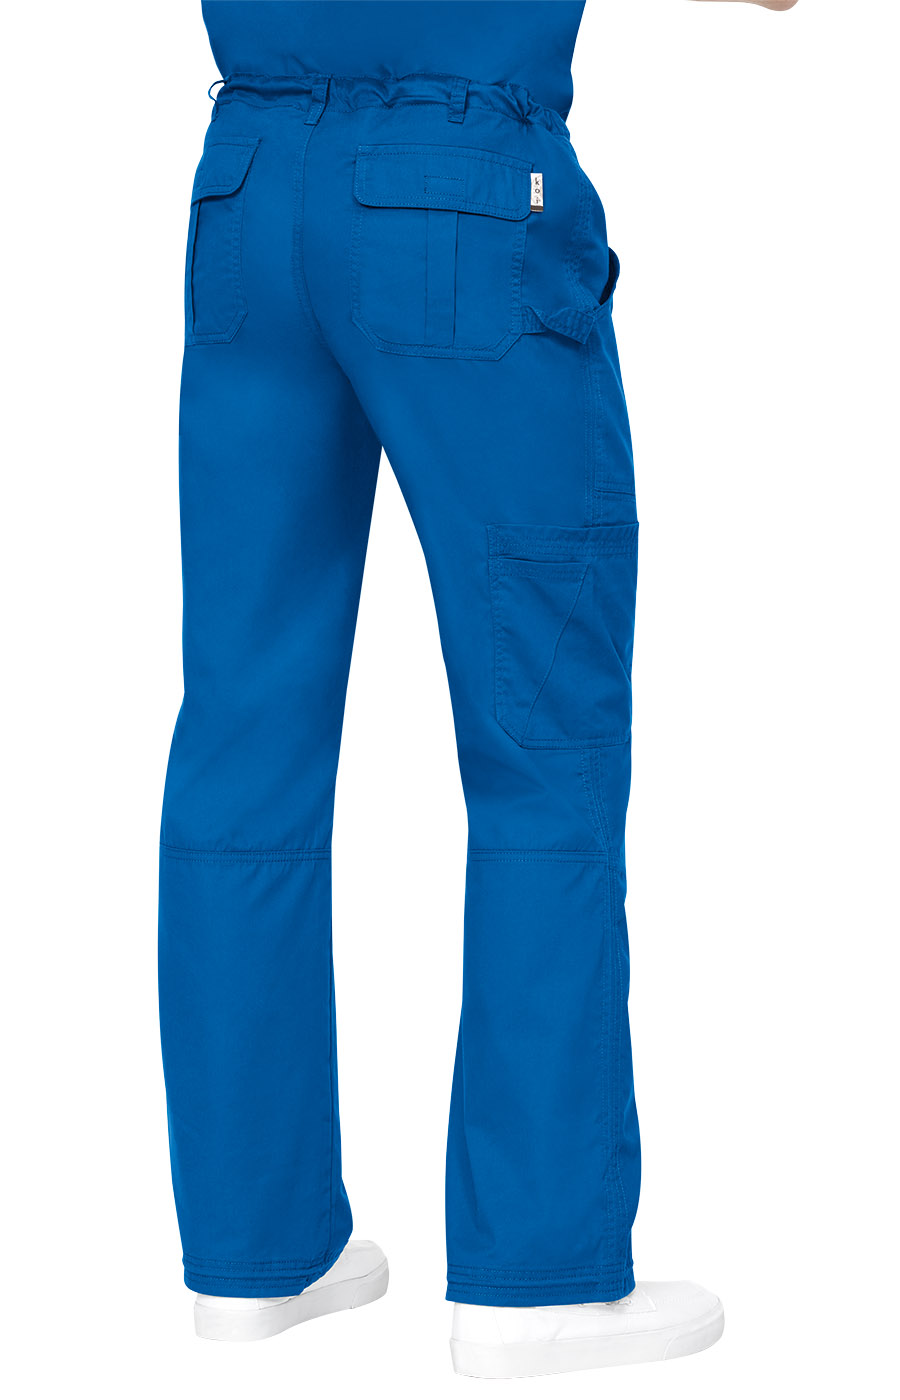 Pantalones Medicos Hombre James Koi 601 Mankaia